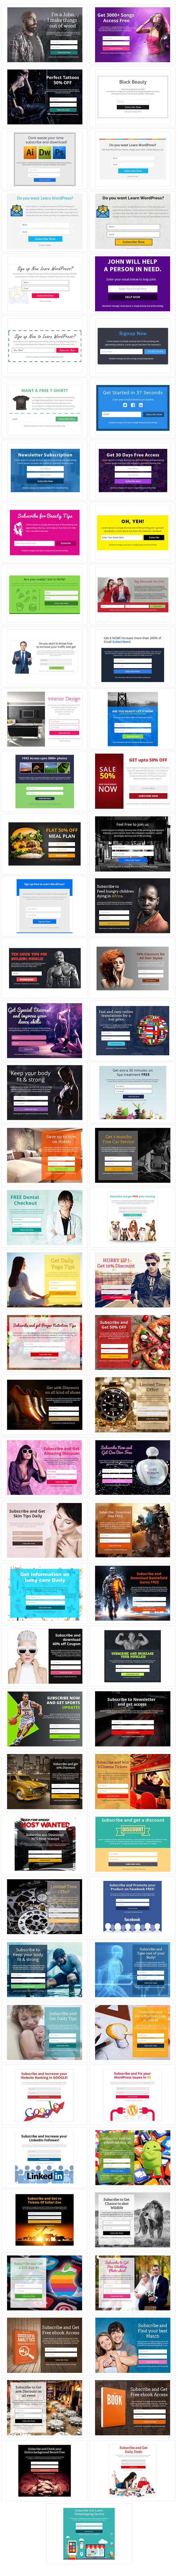 Opt-in Samurai - Create Beautiful Opt-in Popup Forms in WordPress - 2